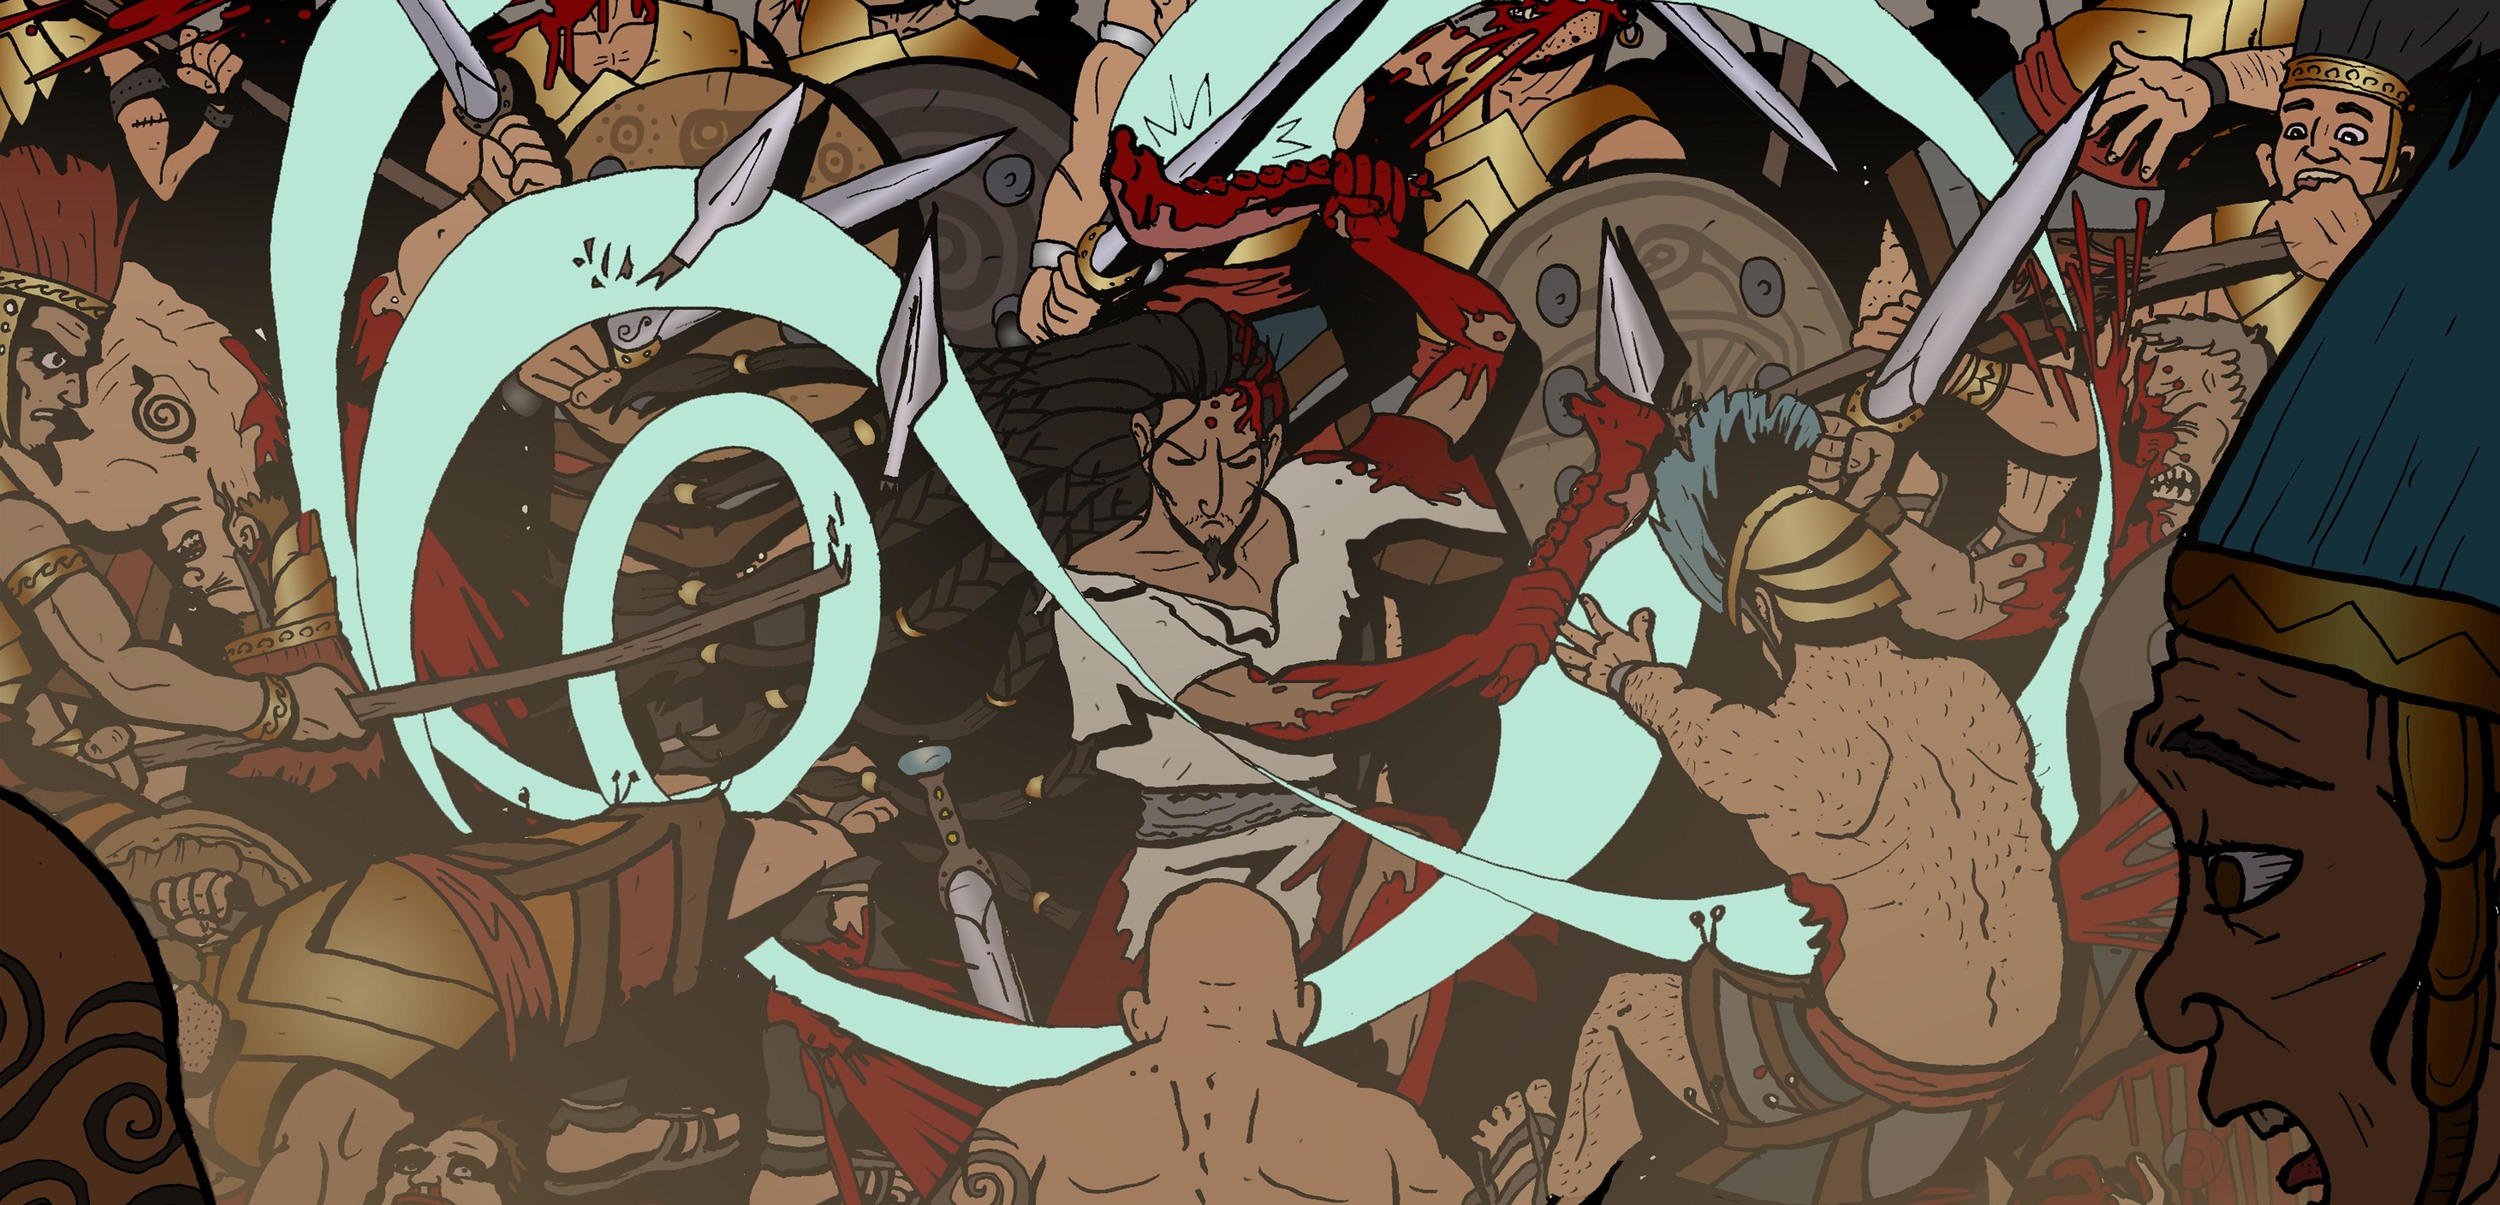 Samson slay thousand 1000 philistines men